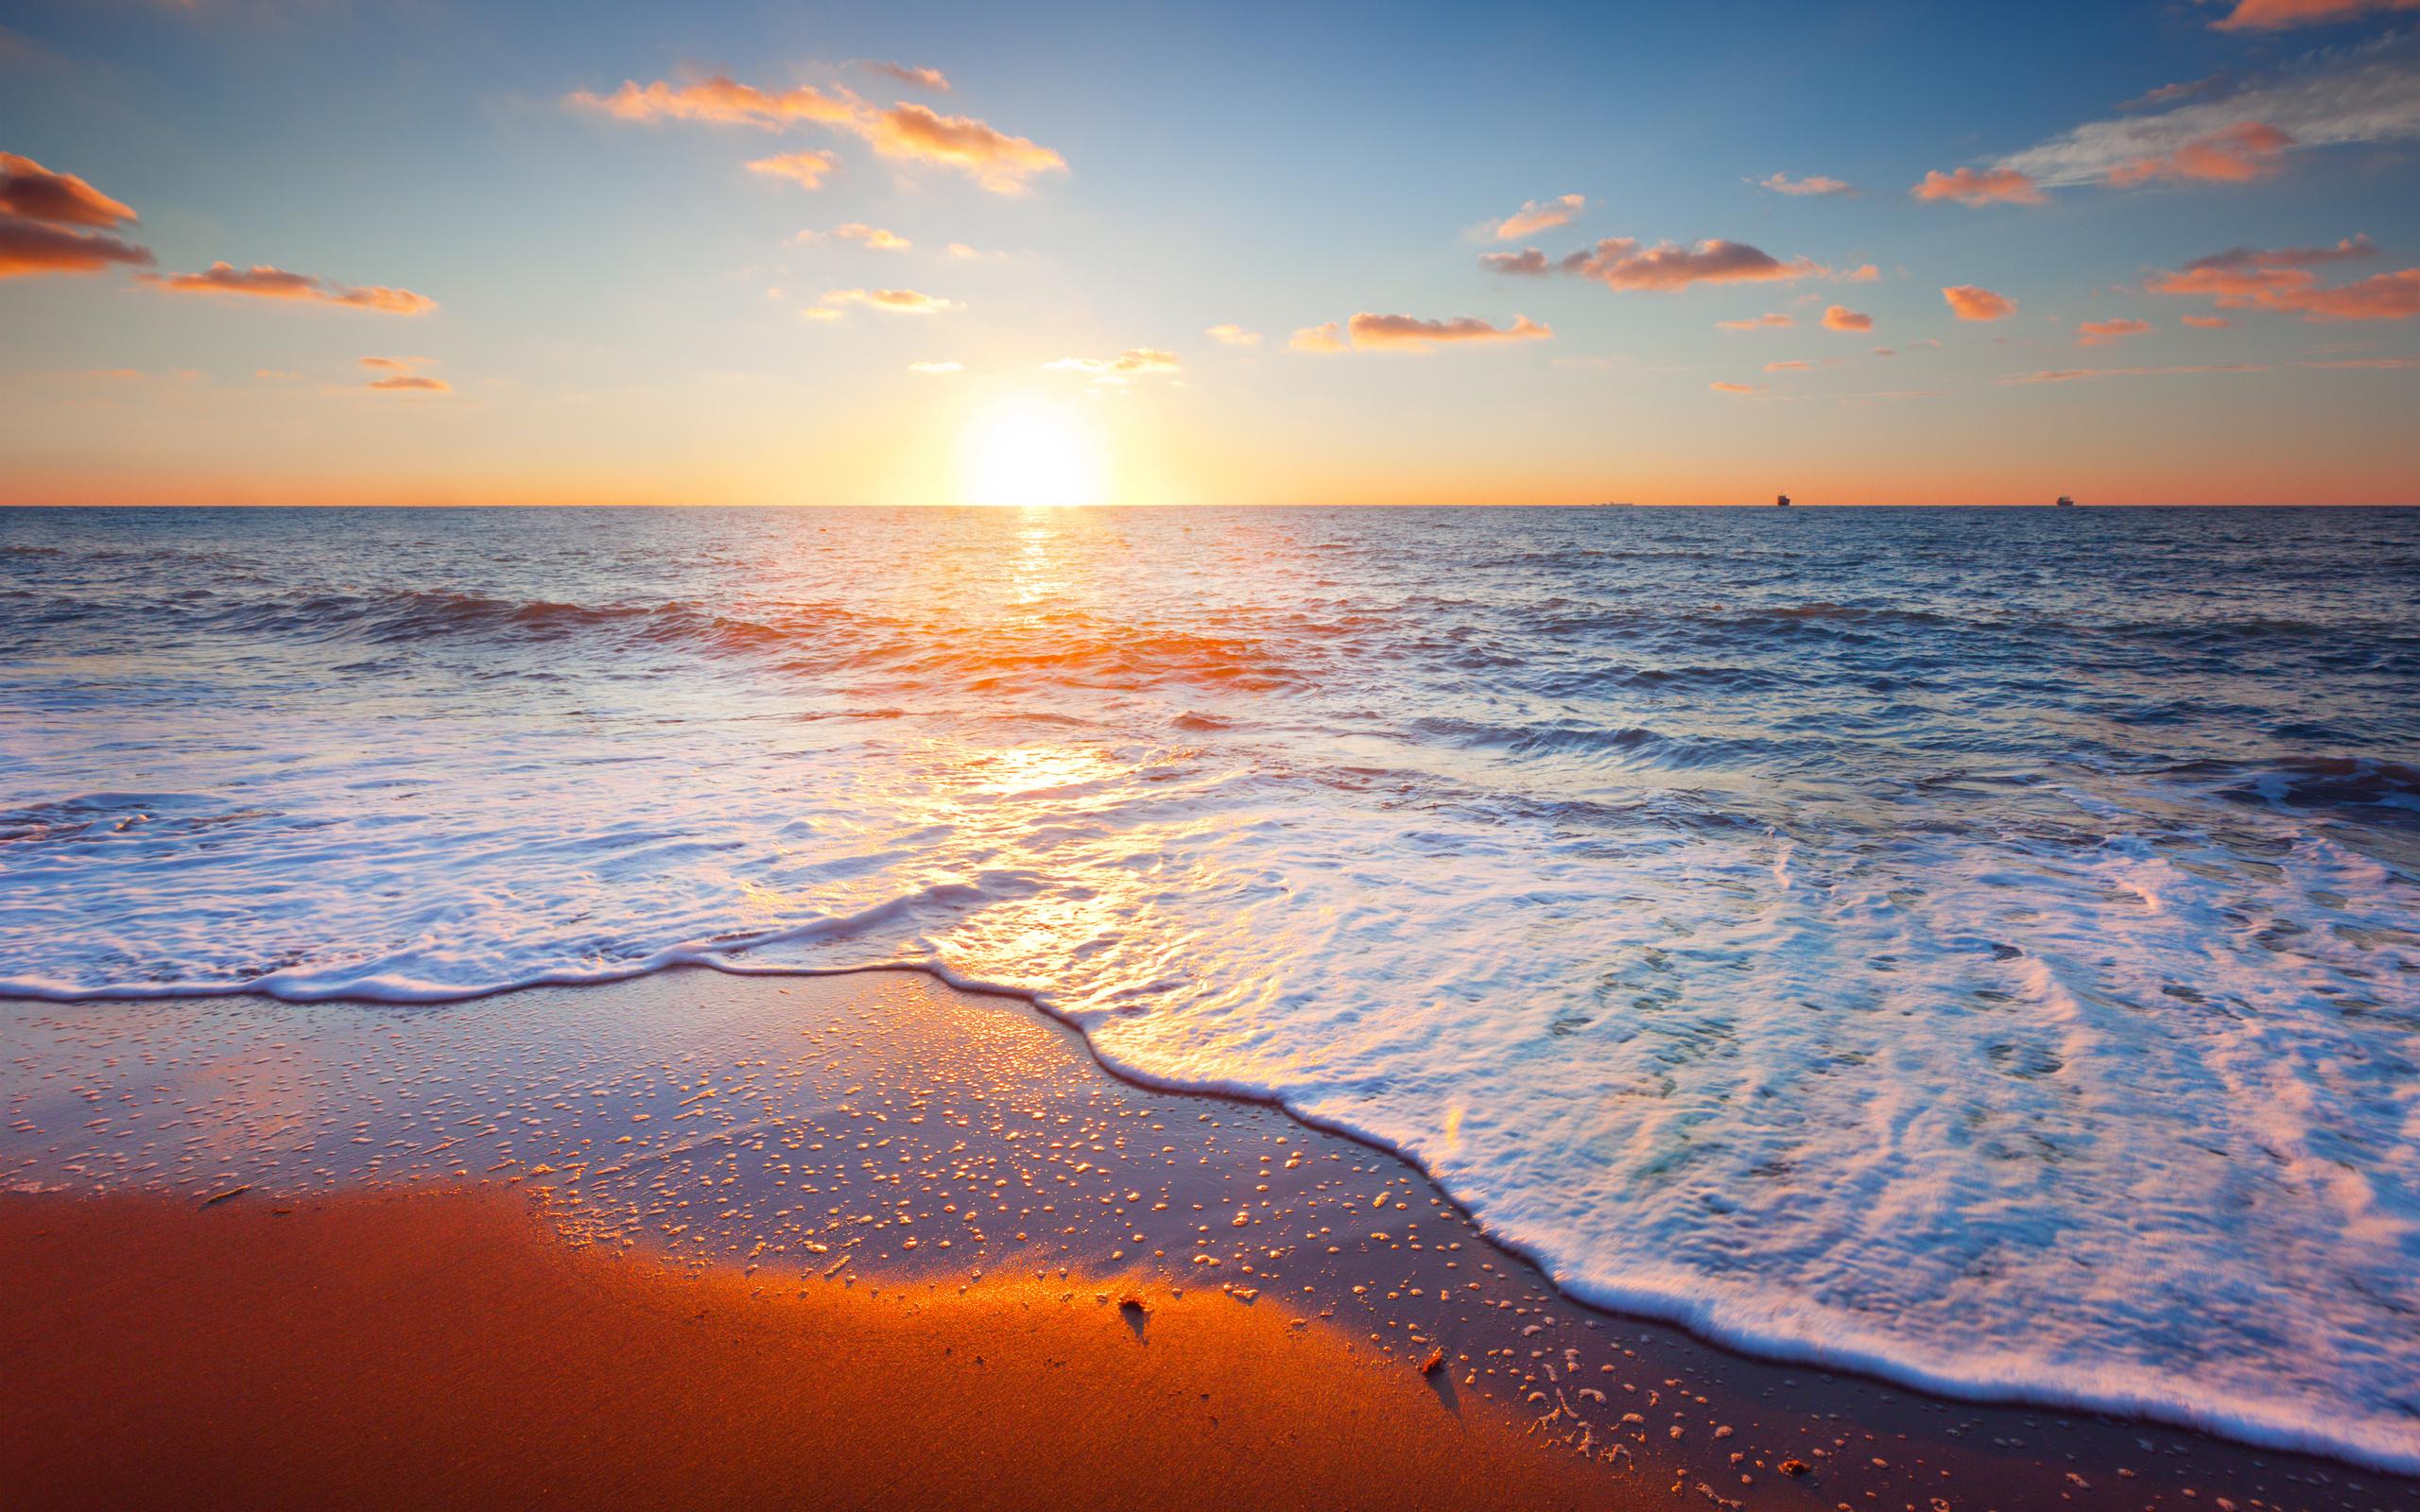 beach sand clouds landscape sea sky beautiful sunset scene wallpaper 2560x1600